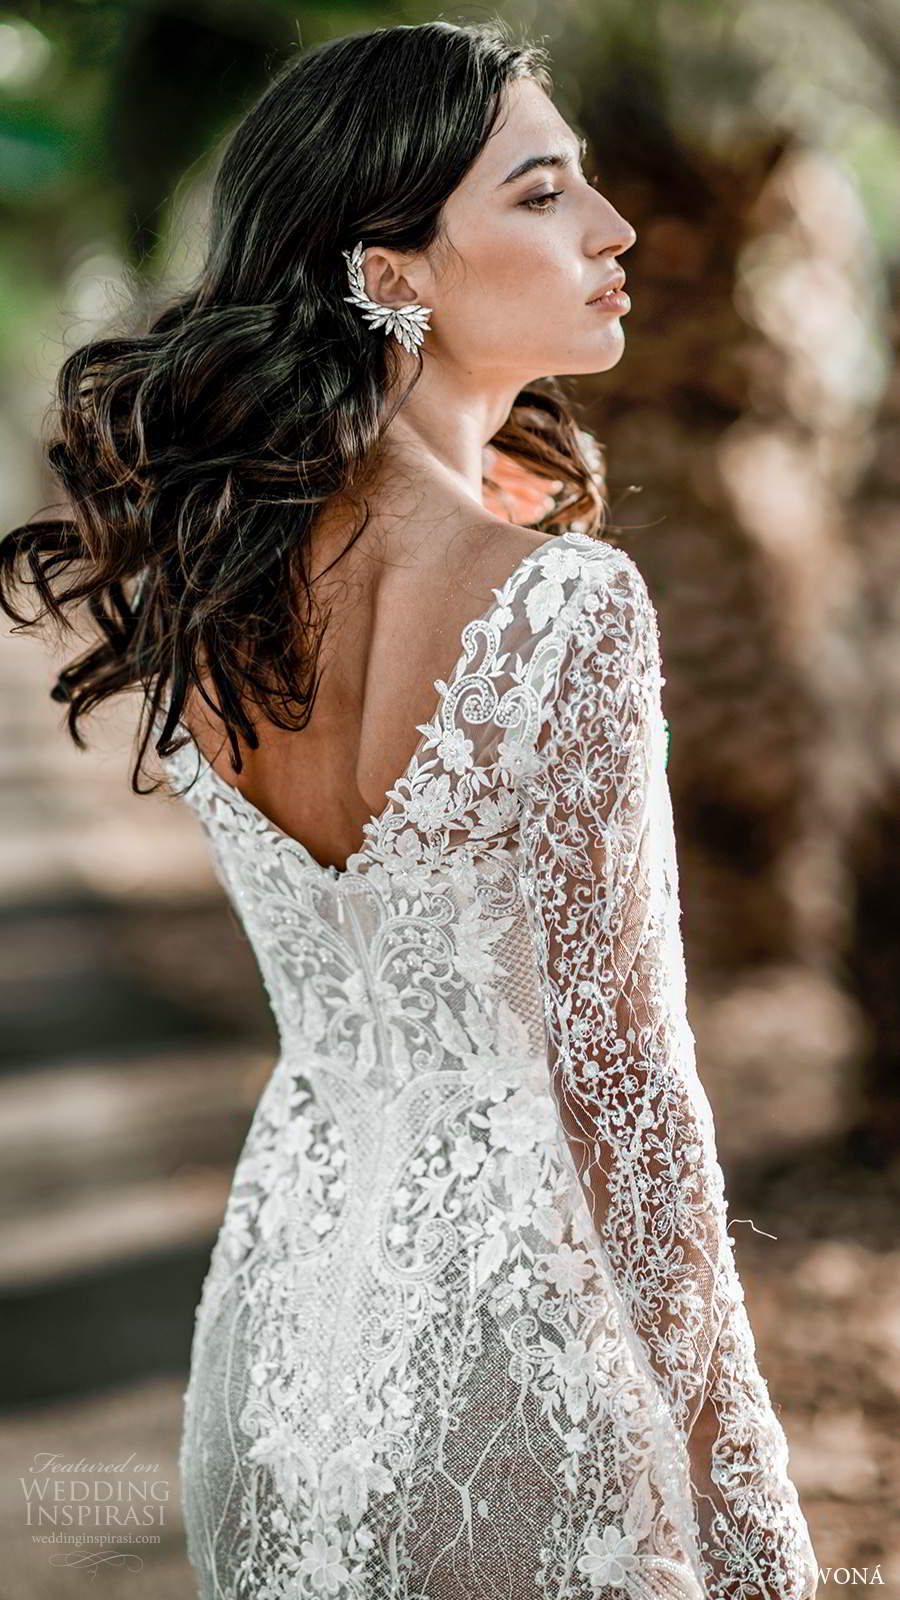 wona fall 2020 bridal illusion long sleeves sweetheart neckline fully embellished lace fit flare mermaid wedding dress blush v back chapel train (12) zbv